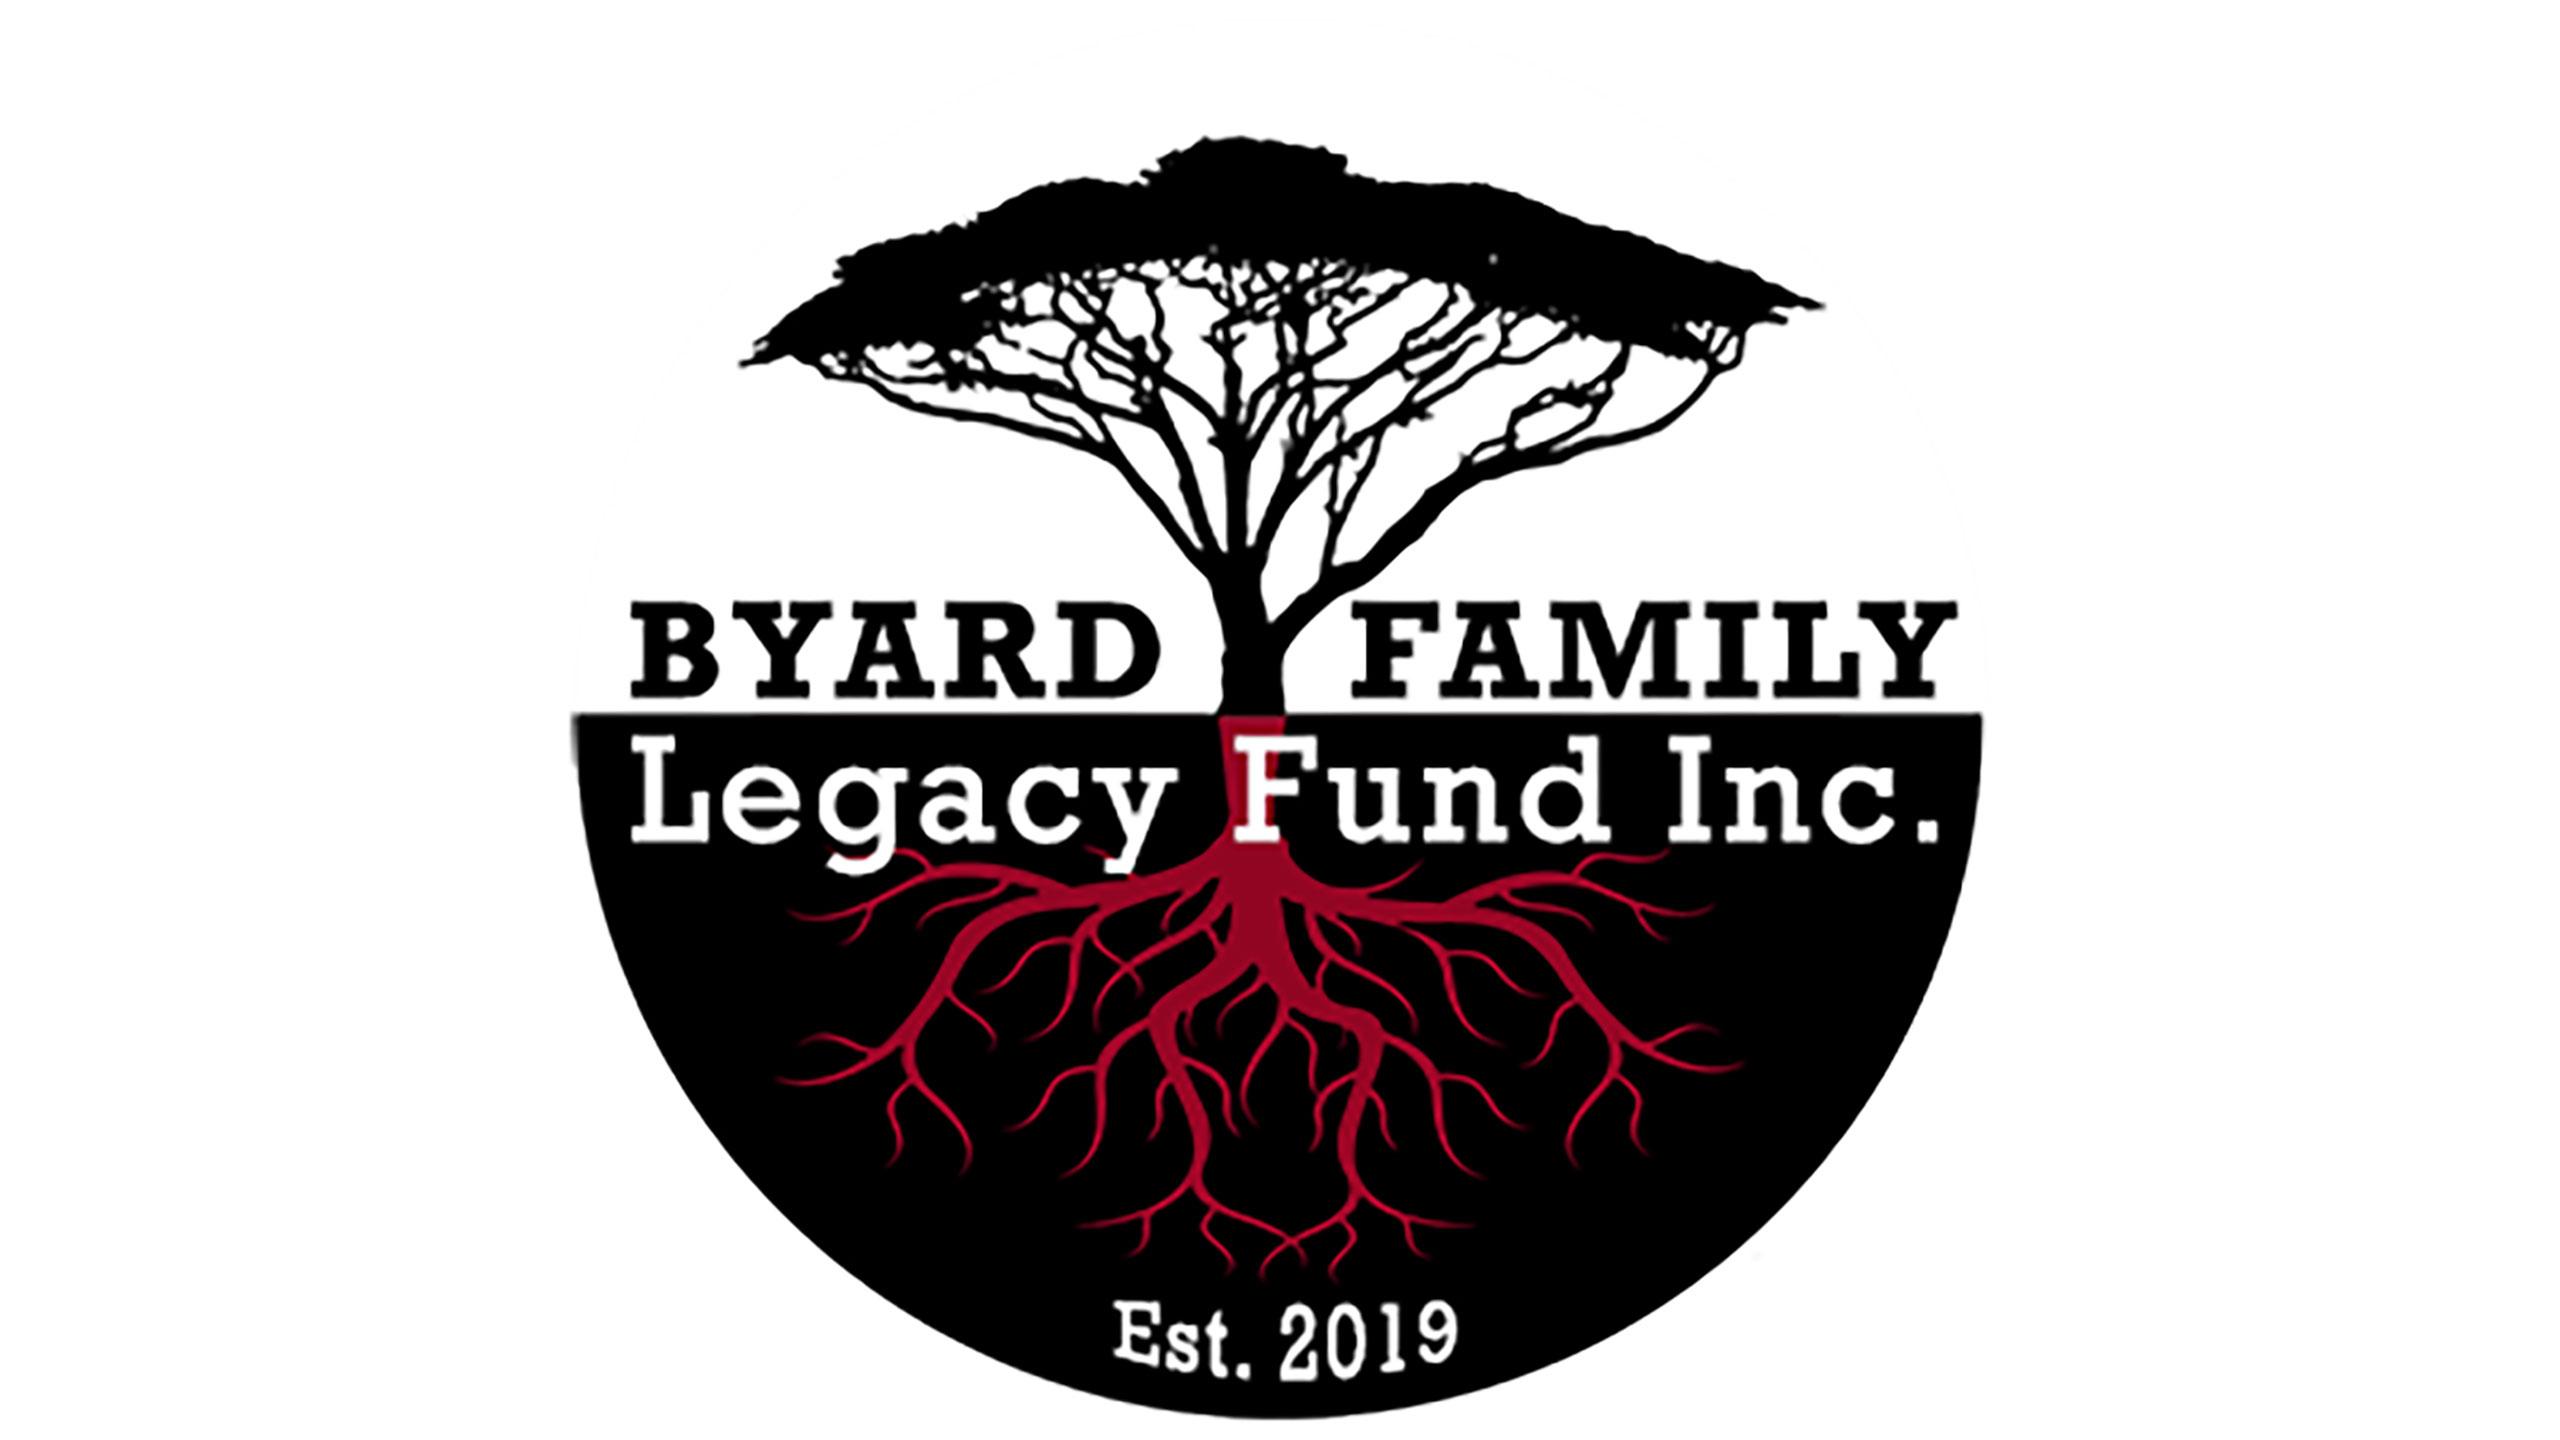 Learn More at ByardFamilyLegacy.org